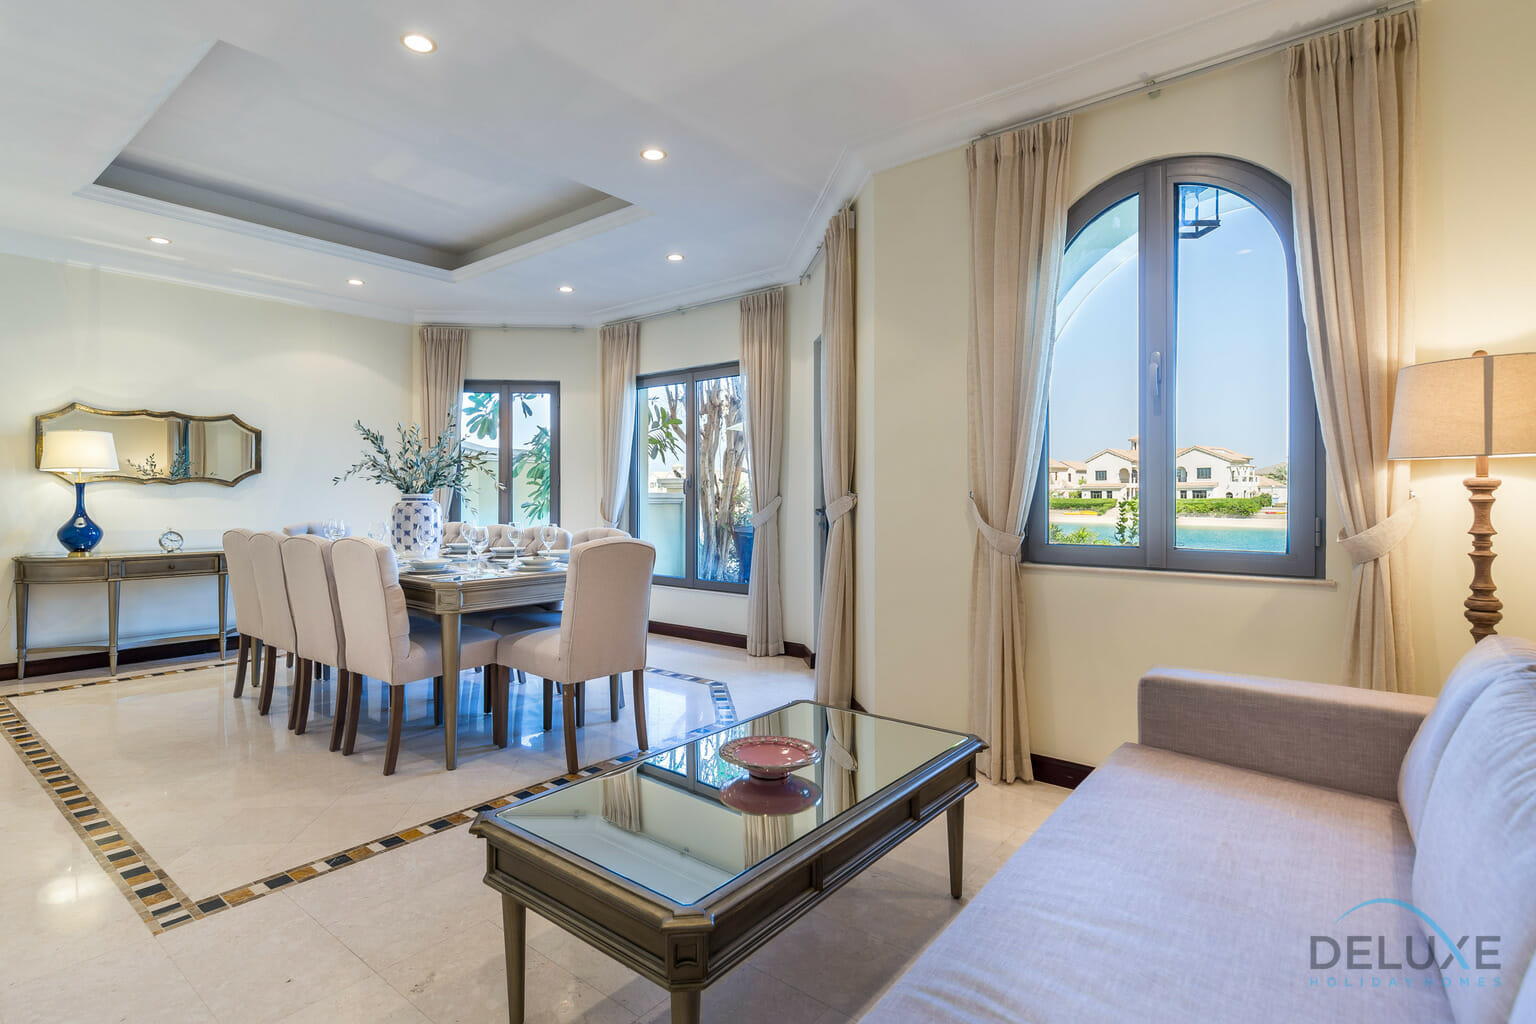 Luxurious 5 Bedrooms Villa in Palm Jumeirah - Deluxe ...